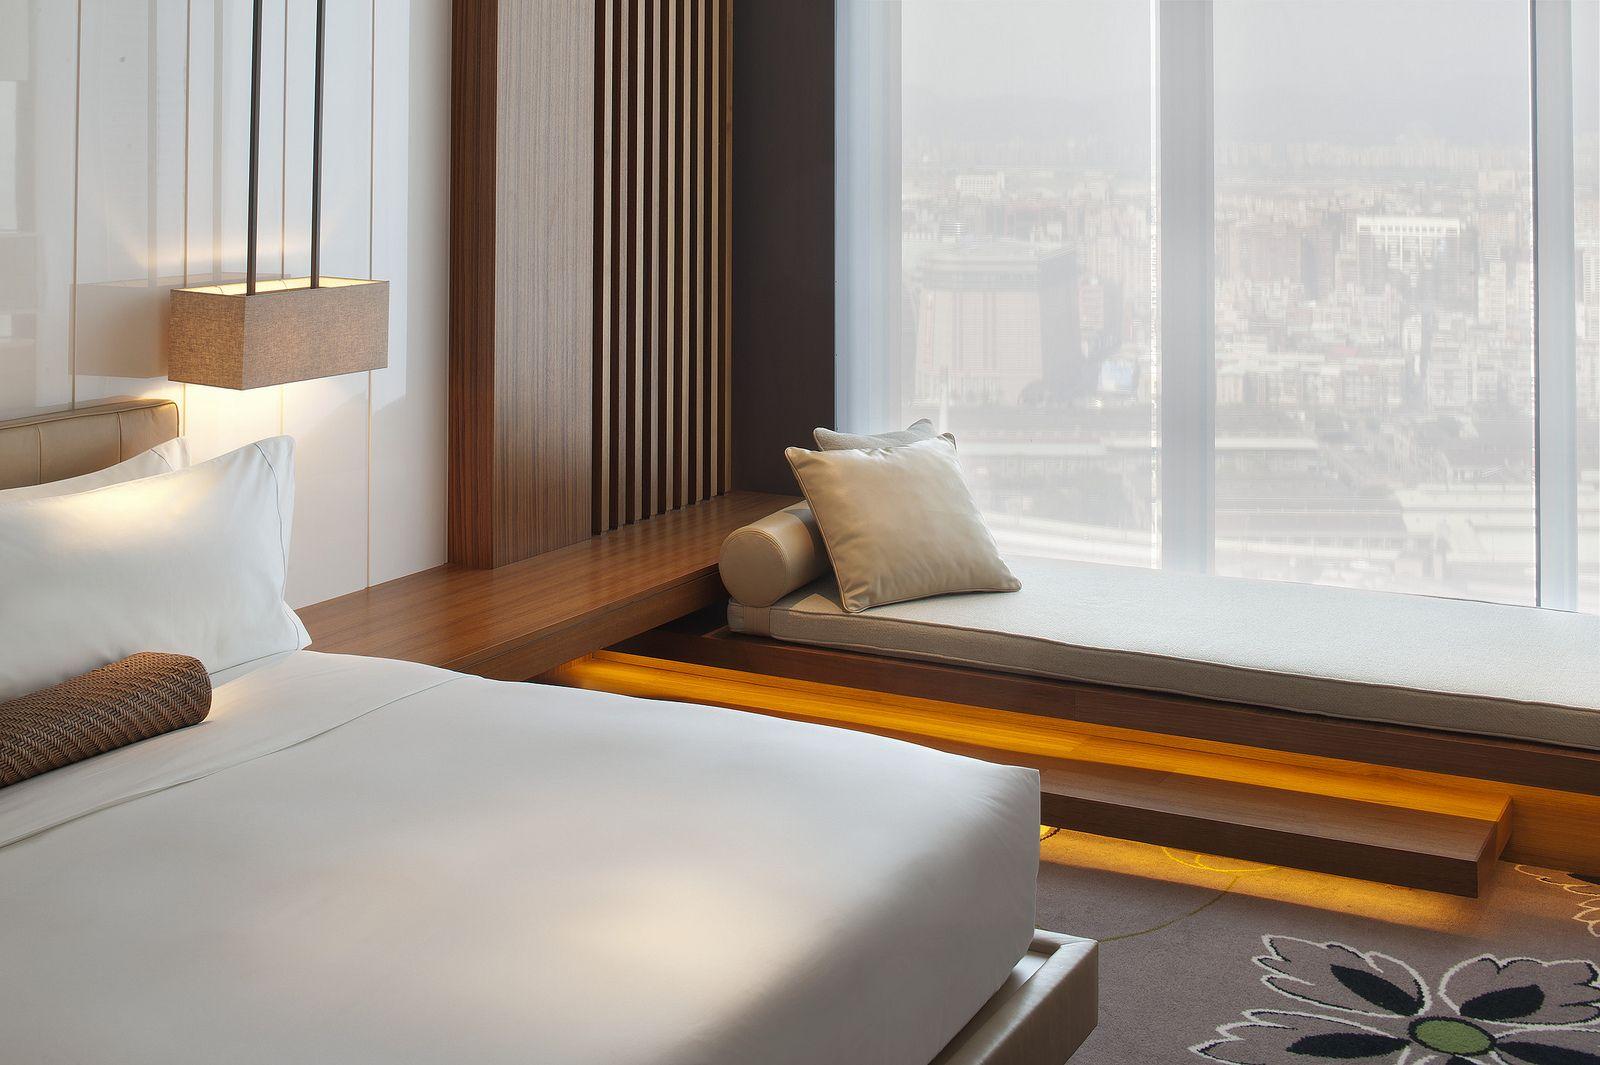 Bed on bay window  w taipeiufabulous room  room bedrooms and bed room